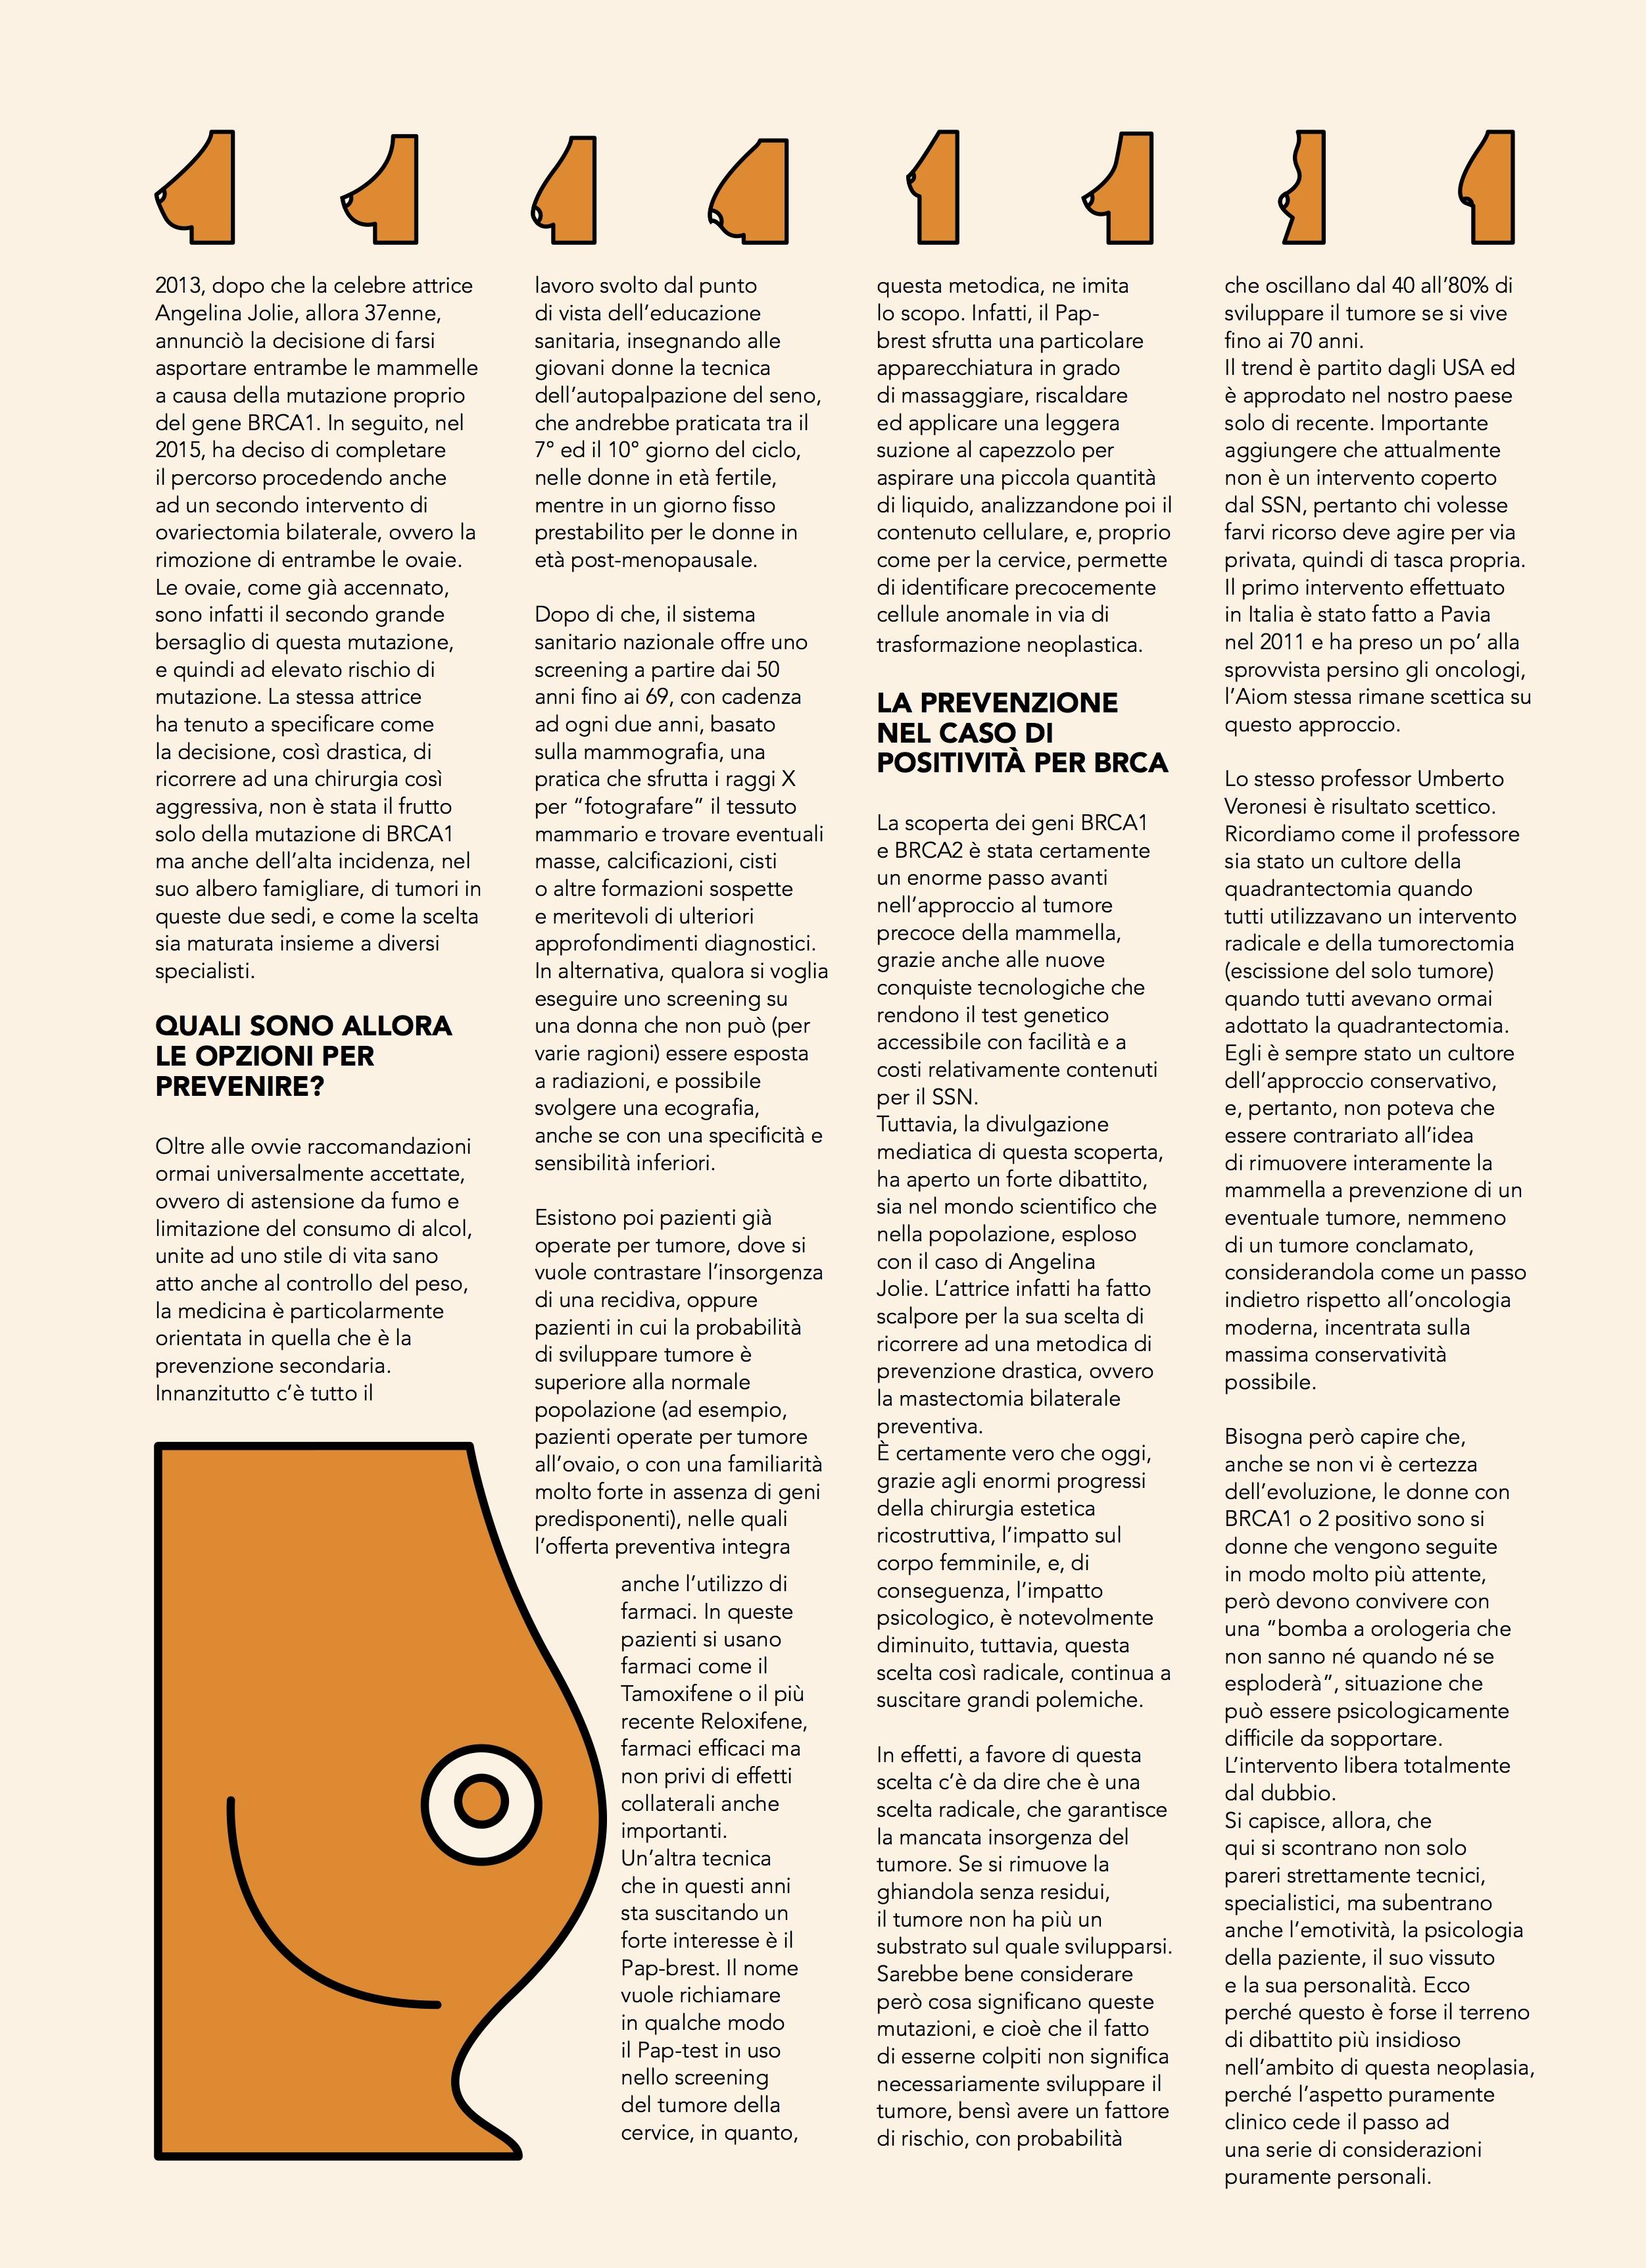 medical editorial magazine : Federica Oronti